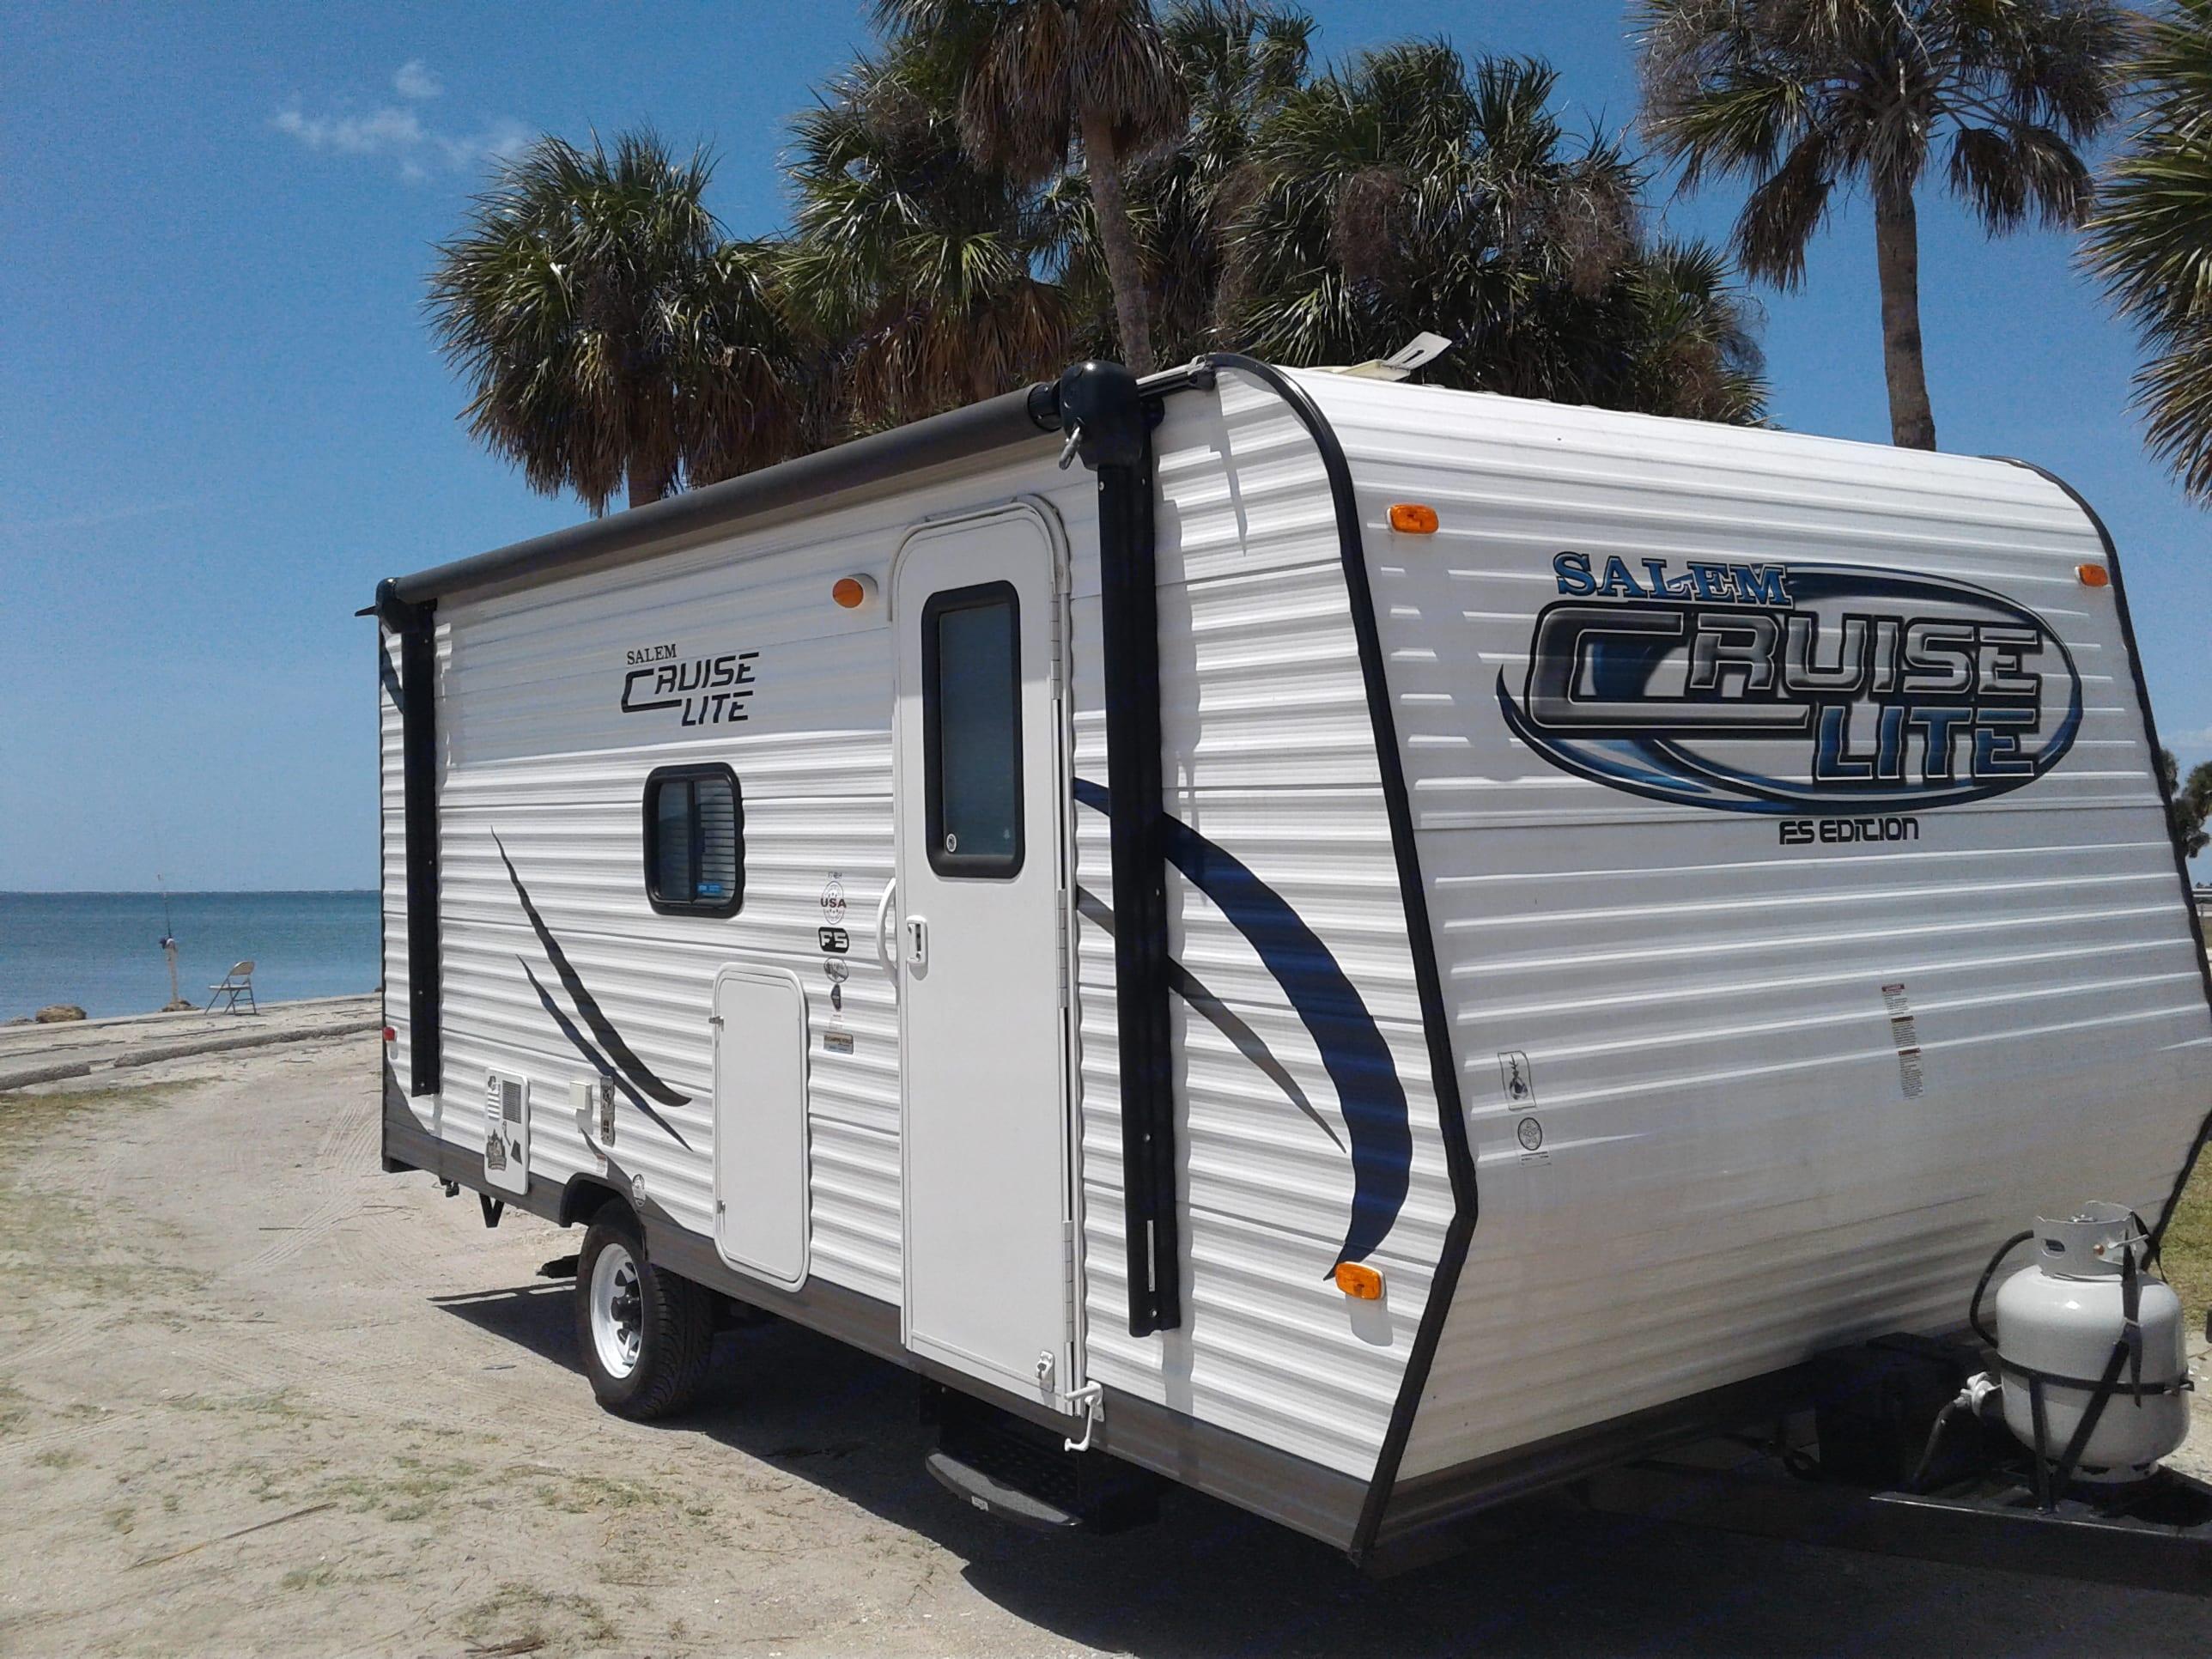 Keystone Salem Cruise Lite 2015